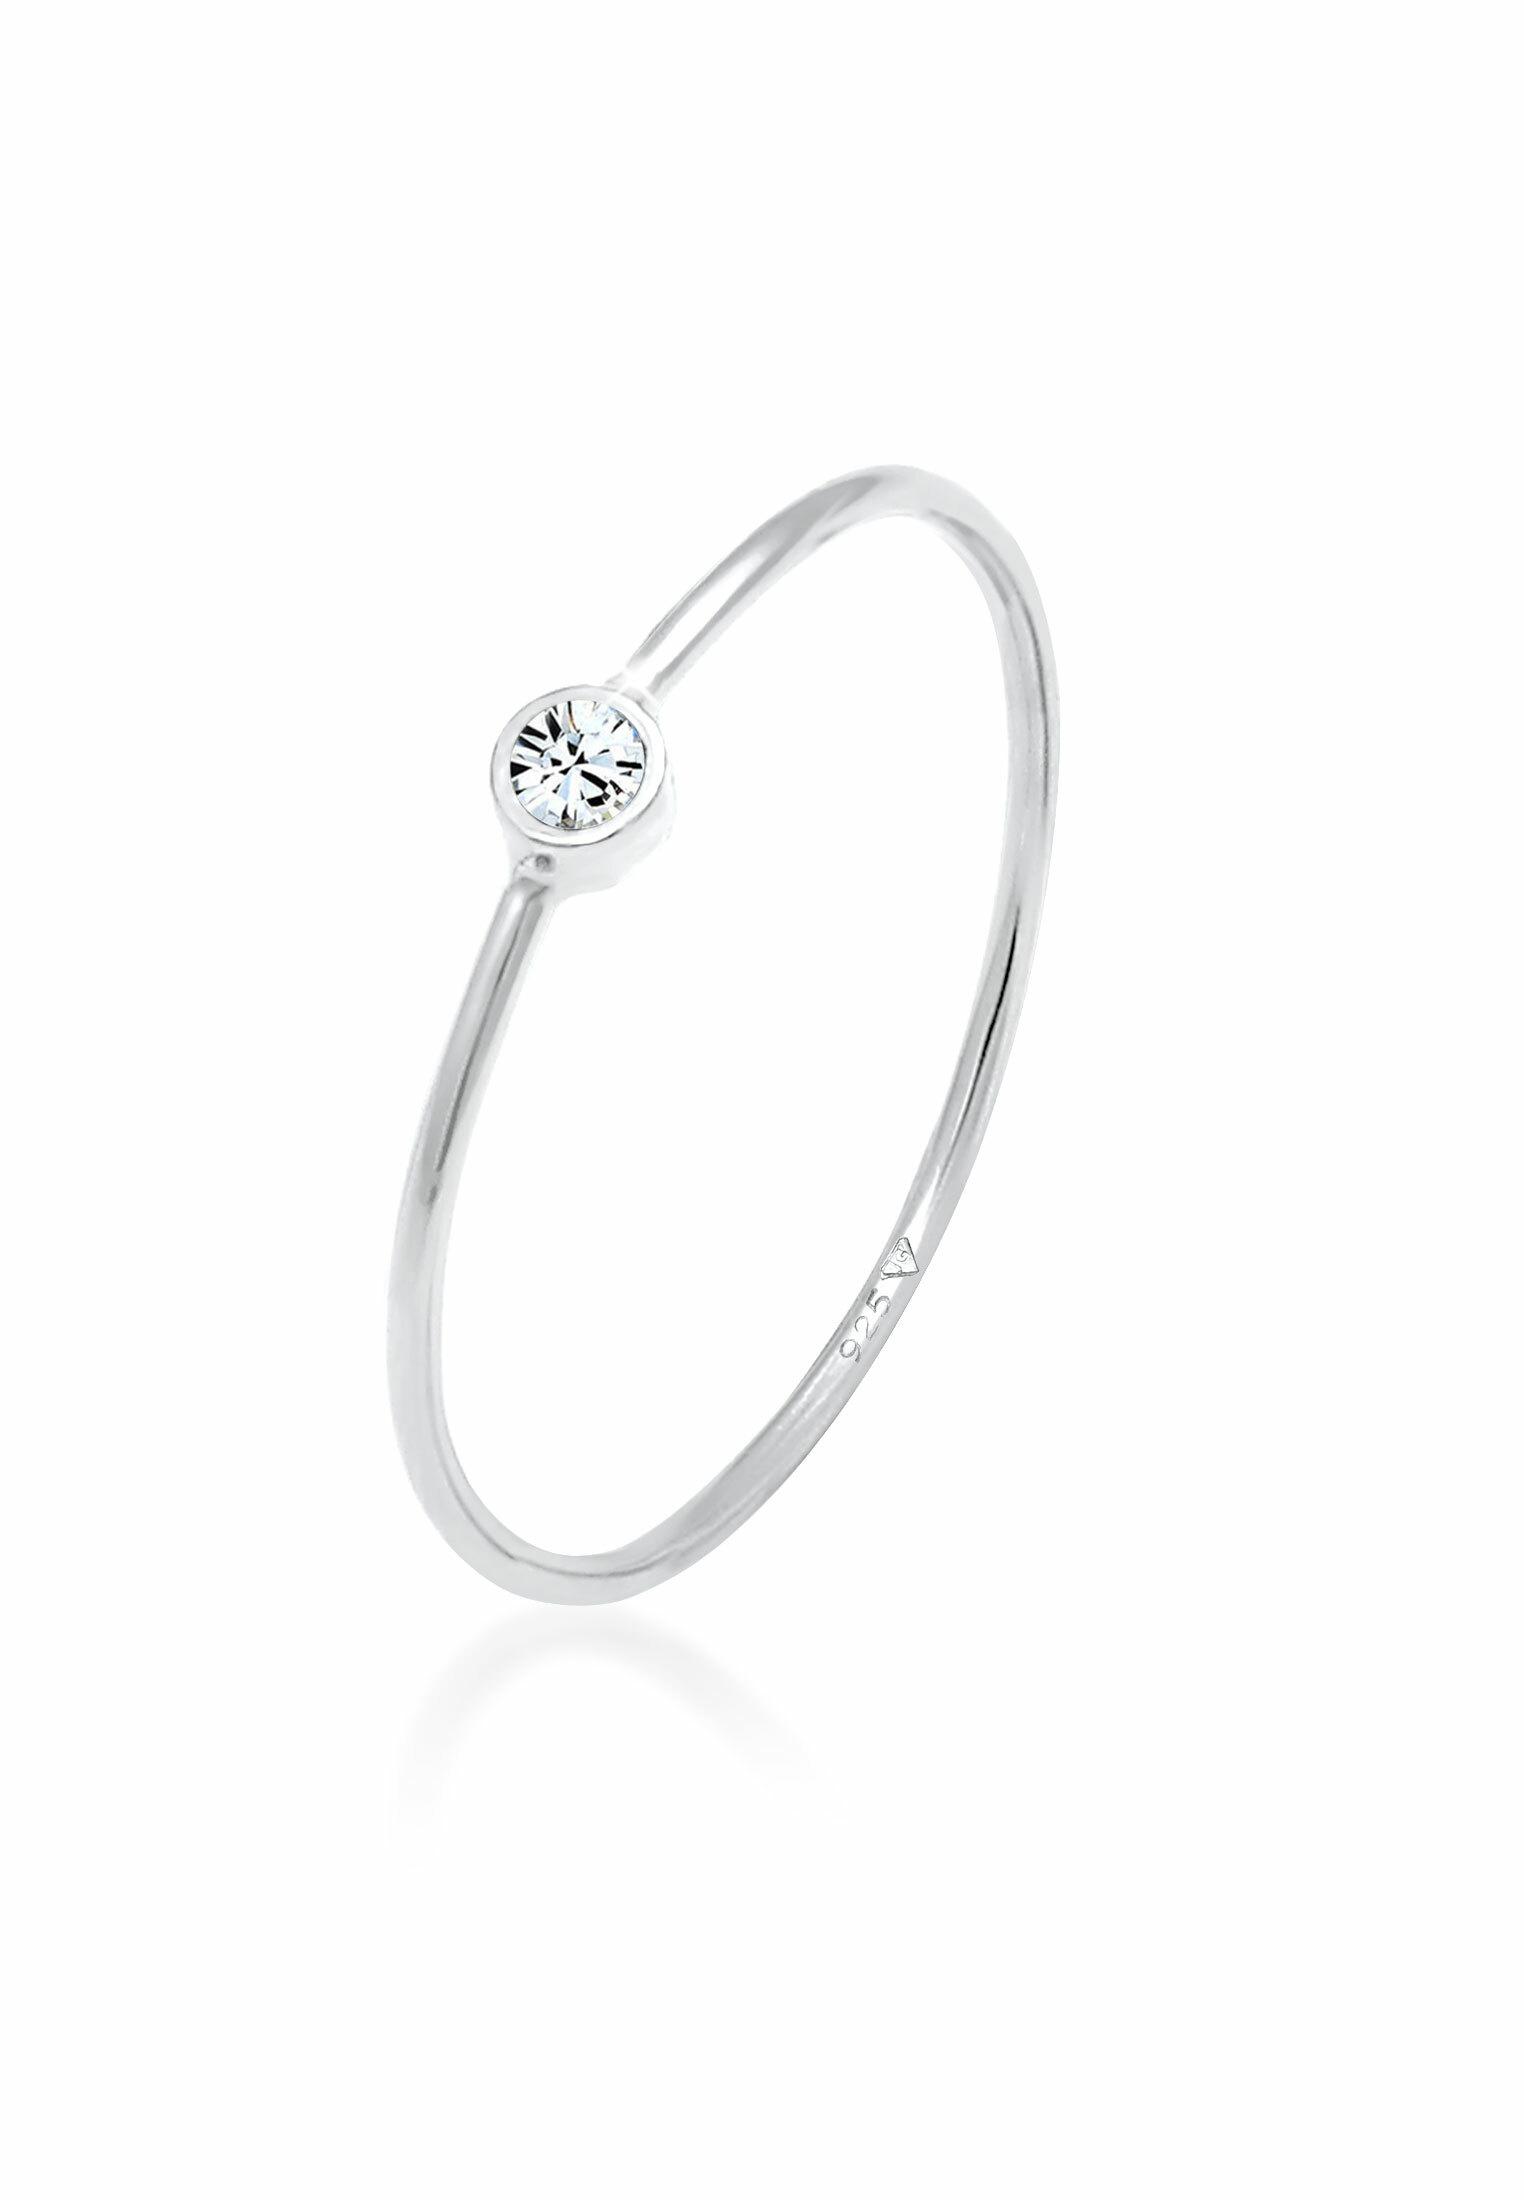 Solitär-Ring | Kristall ( Weiß ) | 925er Sterling Silber